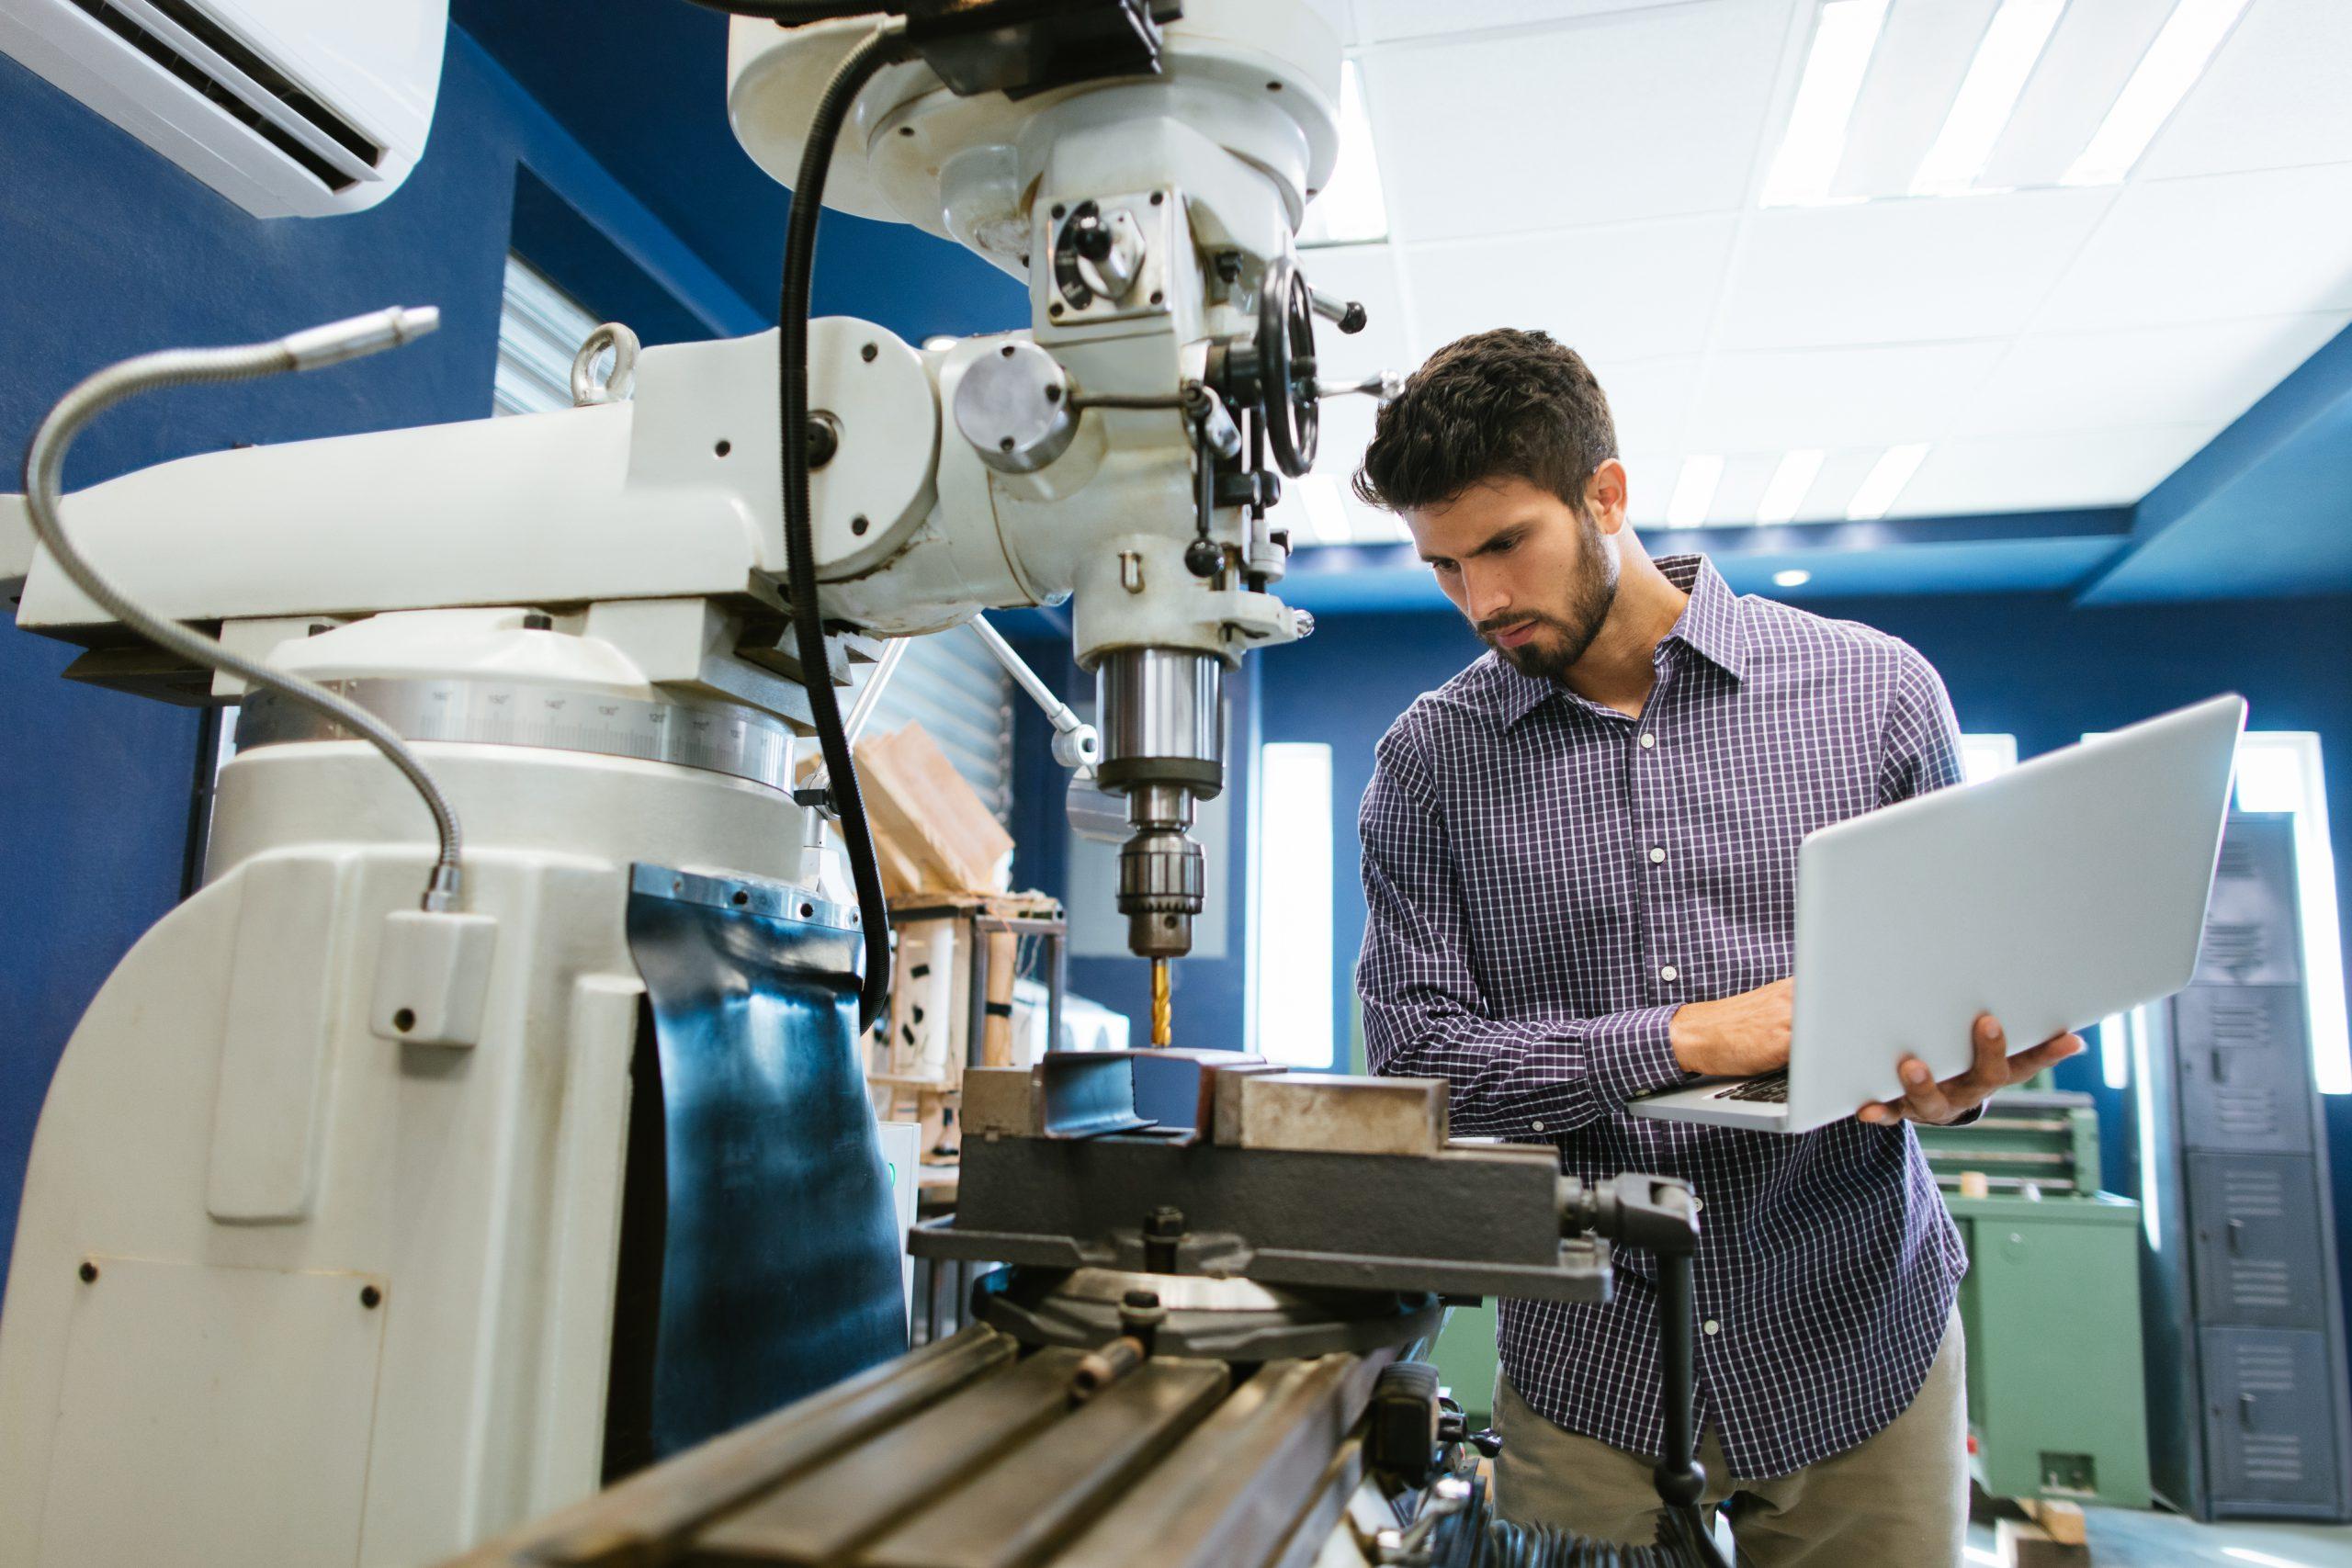 Industria 4.0 mecanizado